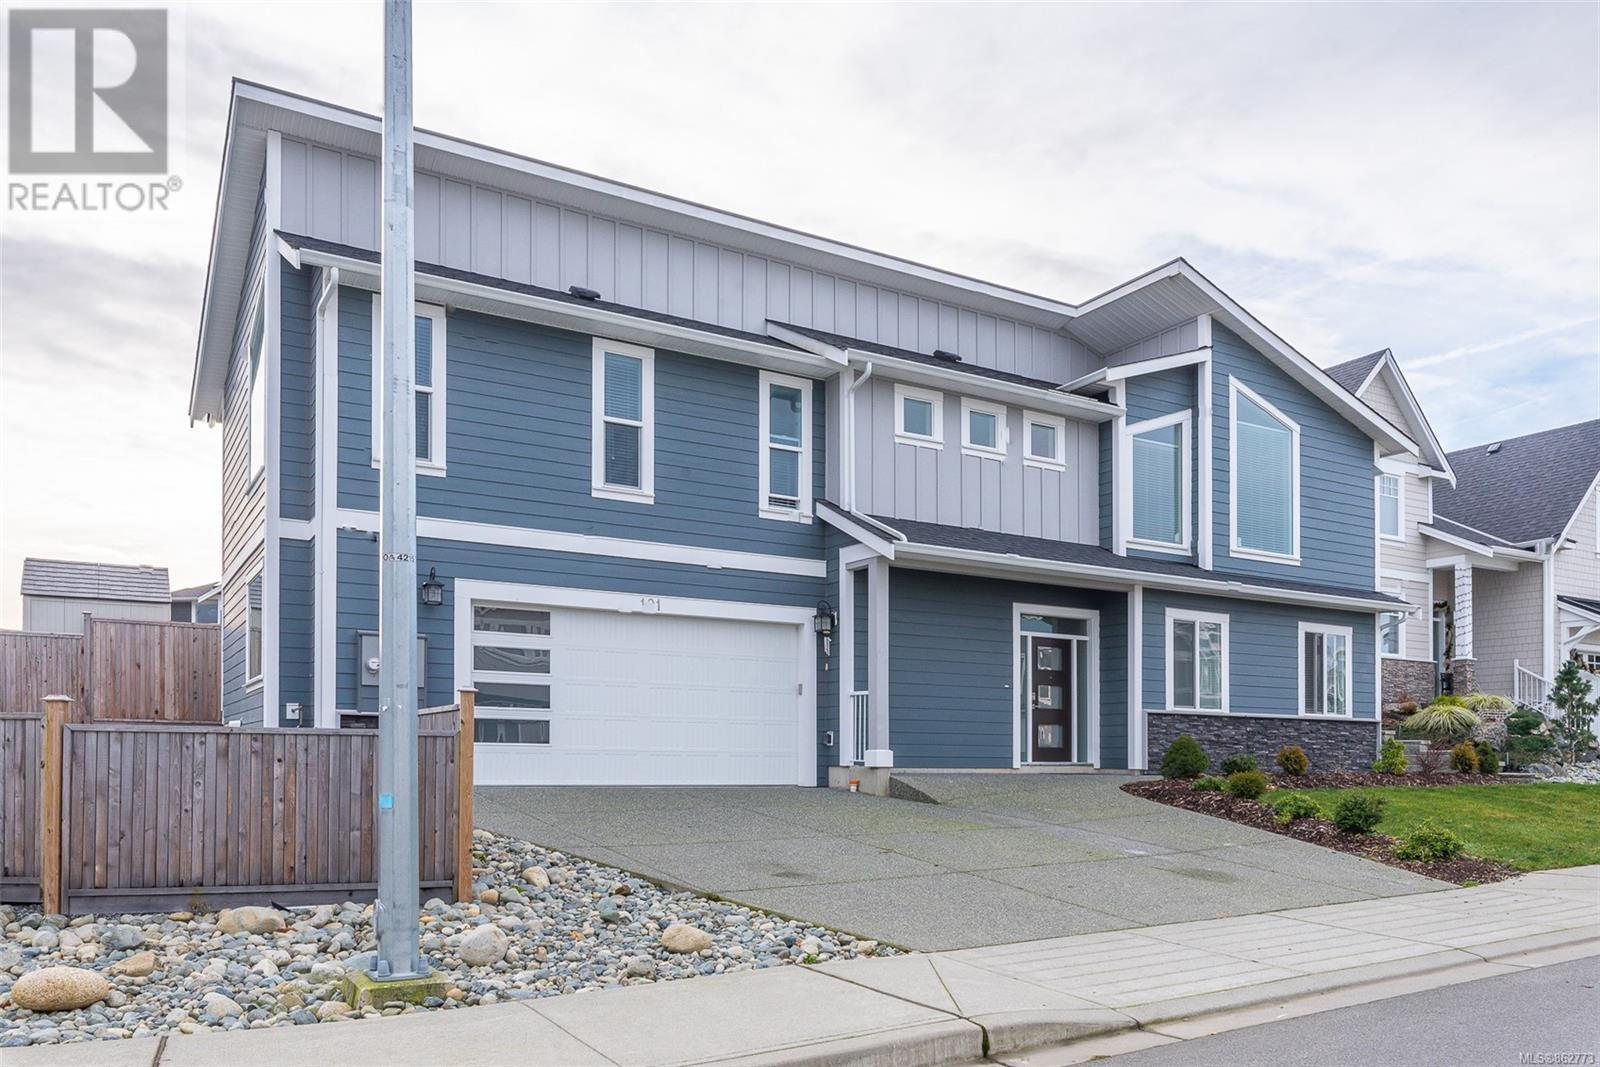 101 Lindquist Rd, Nanaimo, British Columbia  V9T 0K2 - Photo 2 - 862773